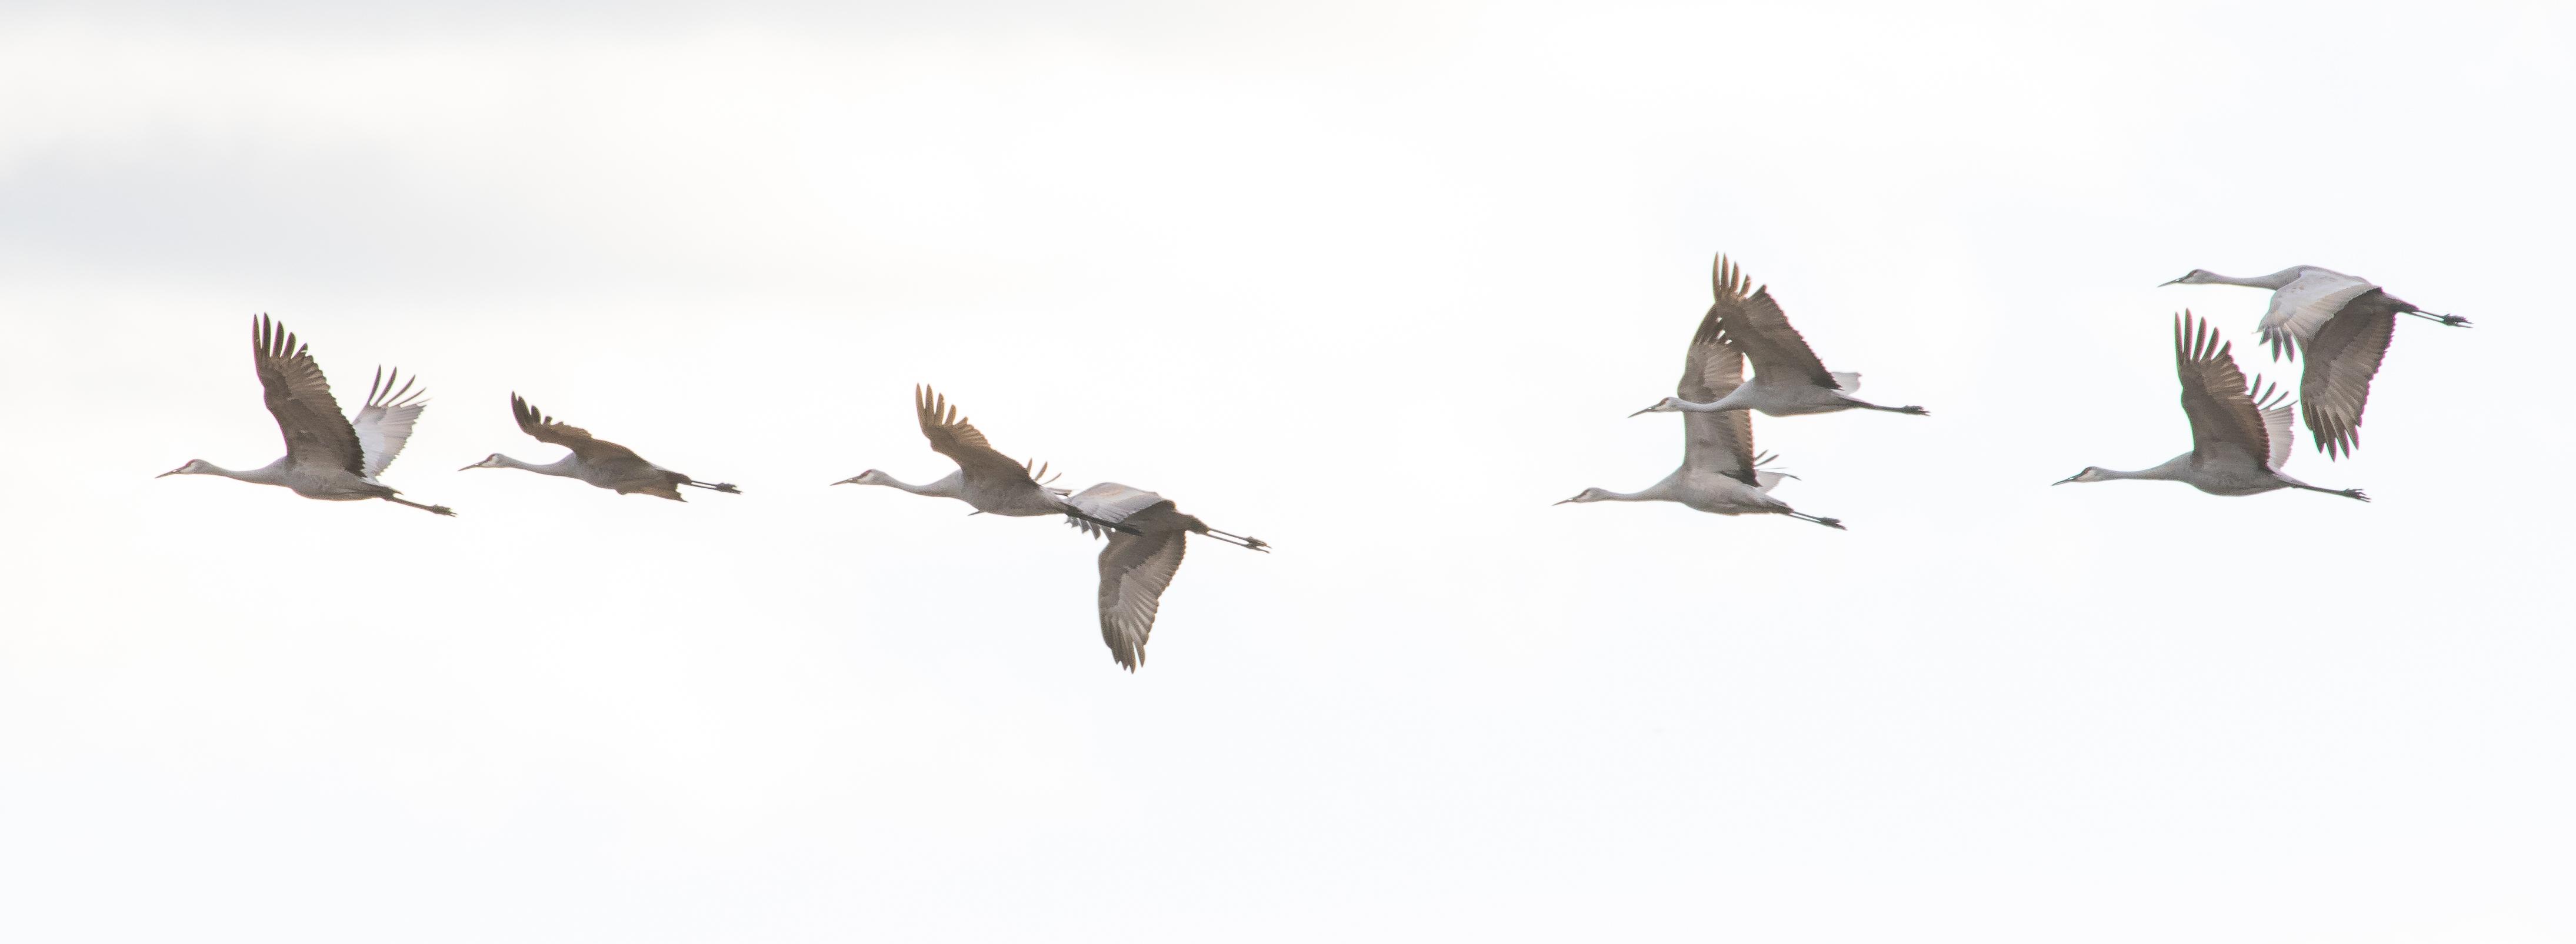 6K9A6973.jpg by Dan Ferrin Photography-Sandhill Cranes